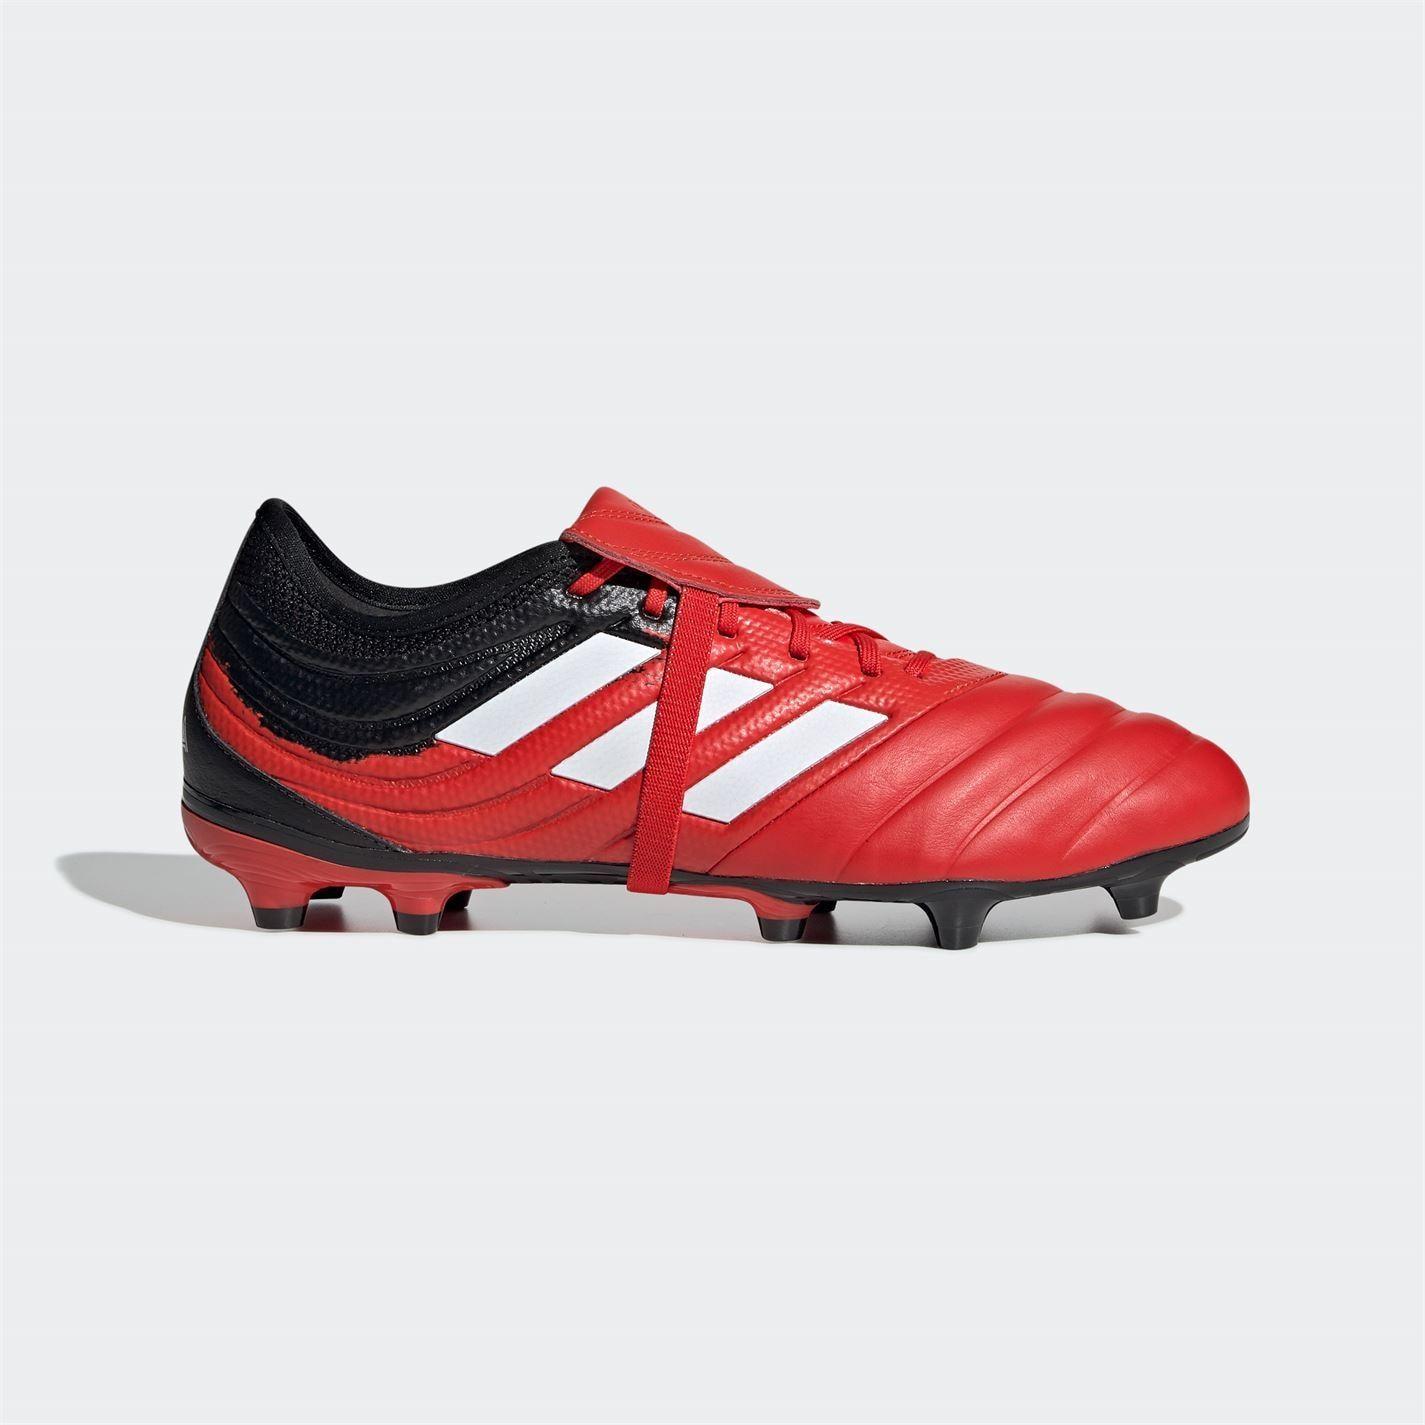 Medalla Fangoso acortar  adidas Copa Gloro 20.2 Mens FG Firm Ground Football Boots Shoes Soccer  Cleats | eBay